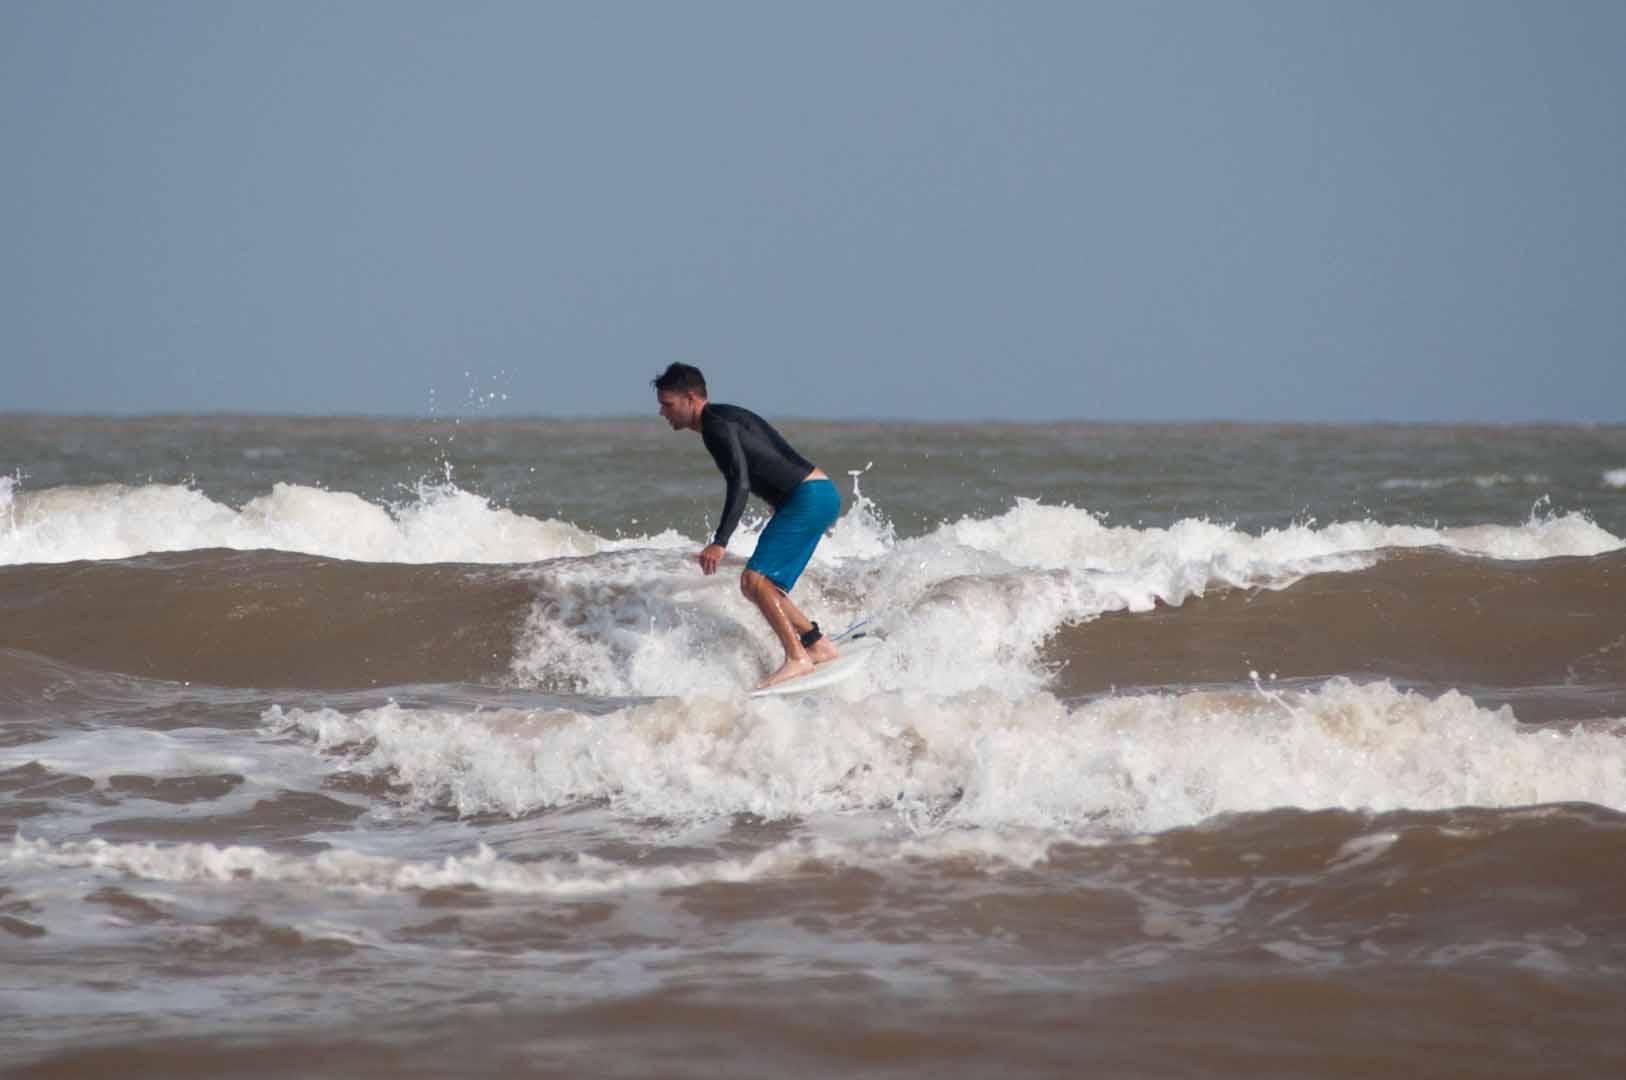 SurfsideJuly2_20150702_135